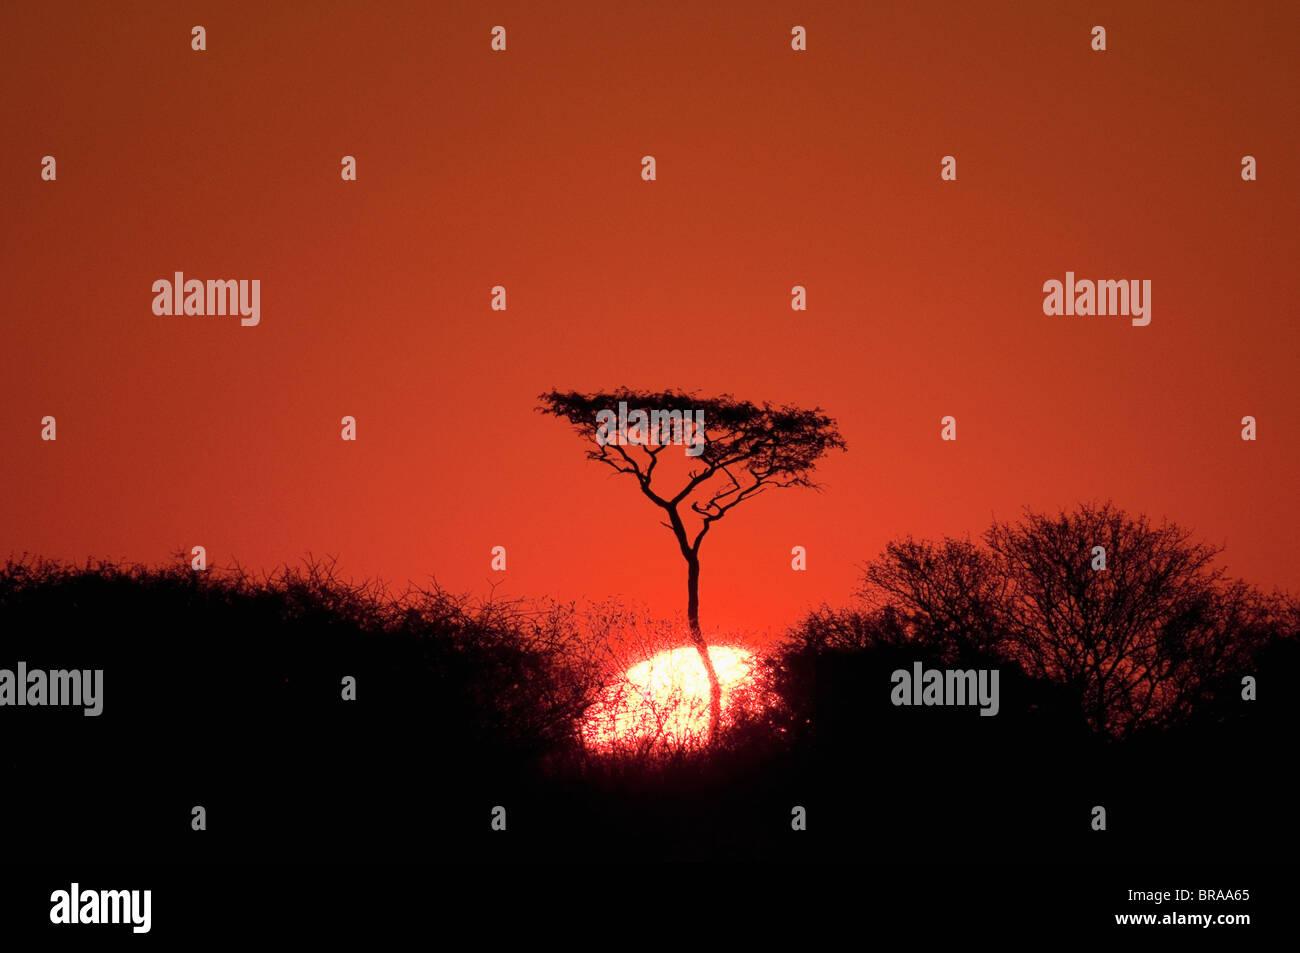 Sunset, Deception Valley, Central Kalahari Game Reserve, Botswana, Sgtivs - Stock Image